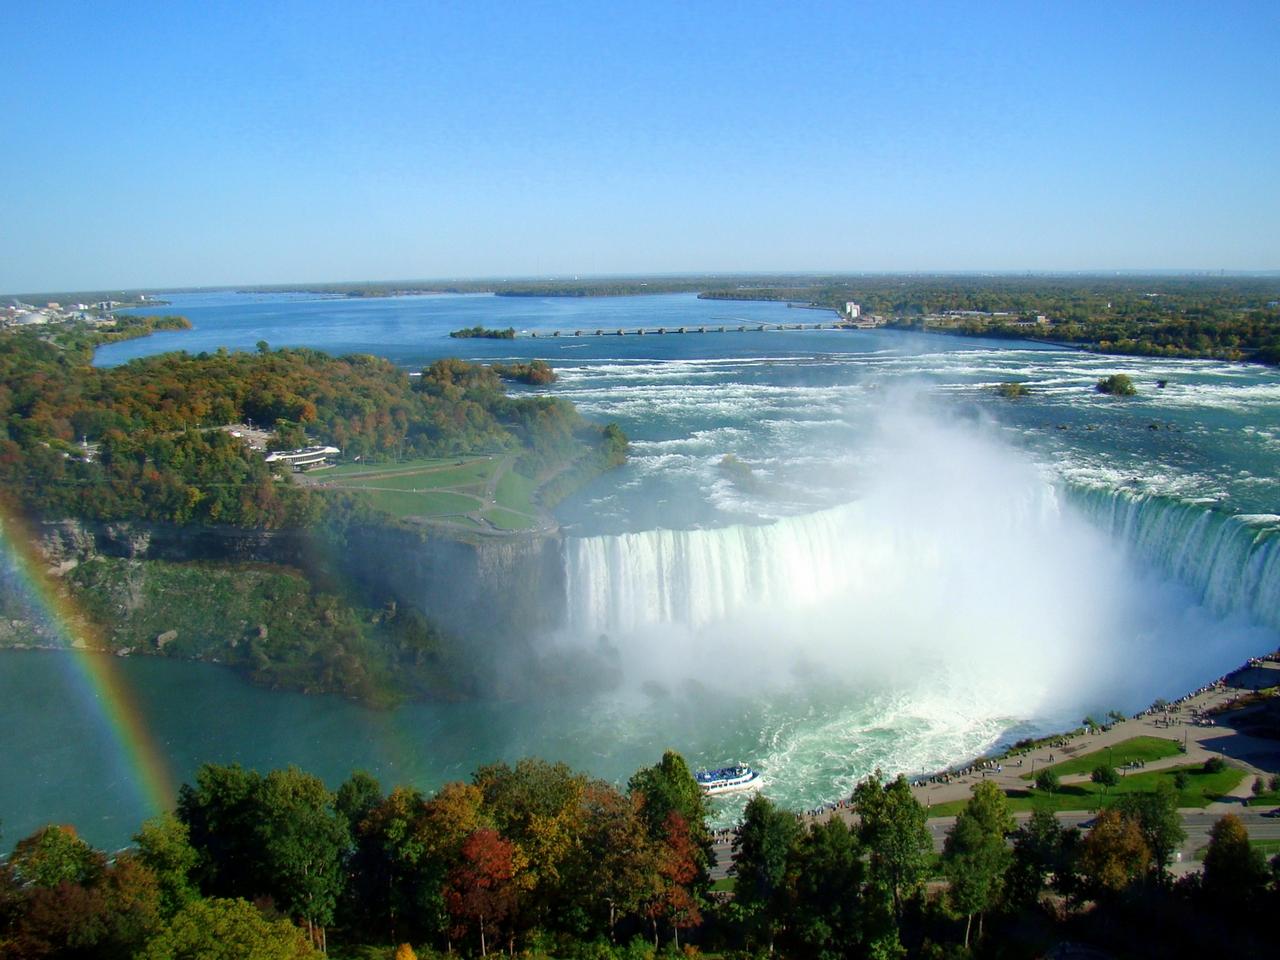 Niagara Falls Computer Wallpapers Desktop Backgrounds 1280x960 ID 1280x960